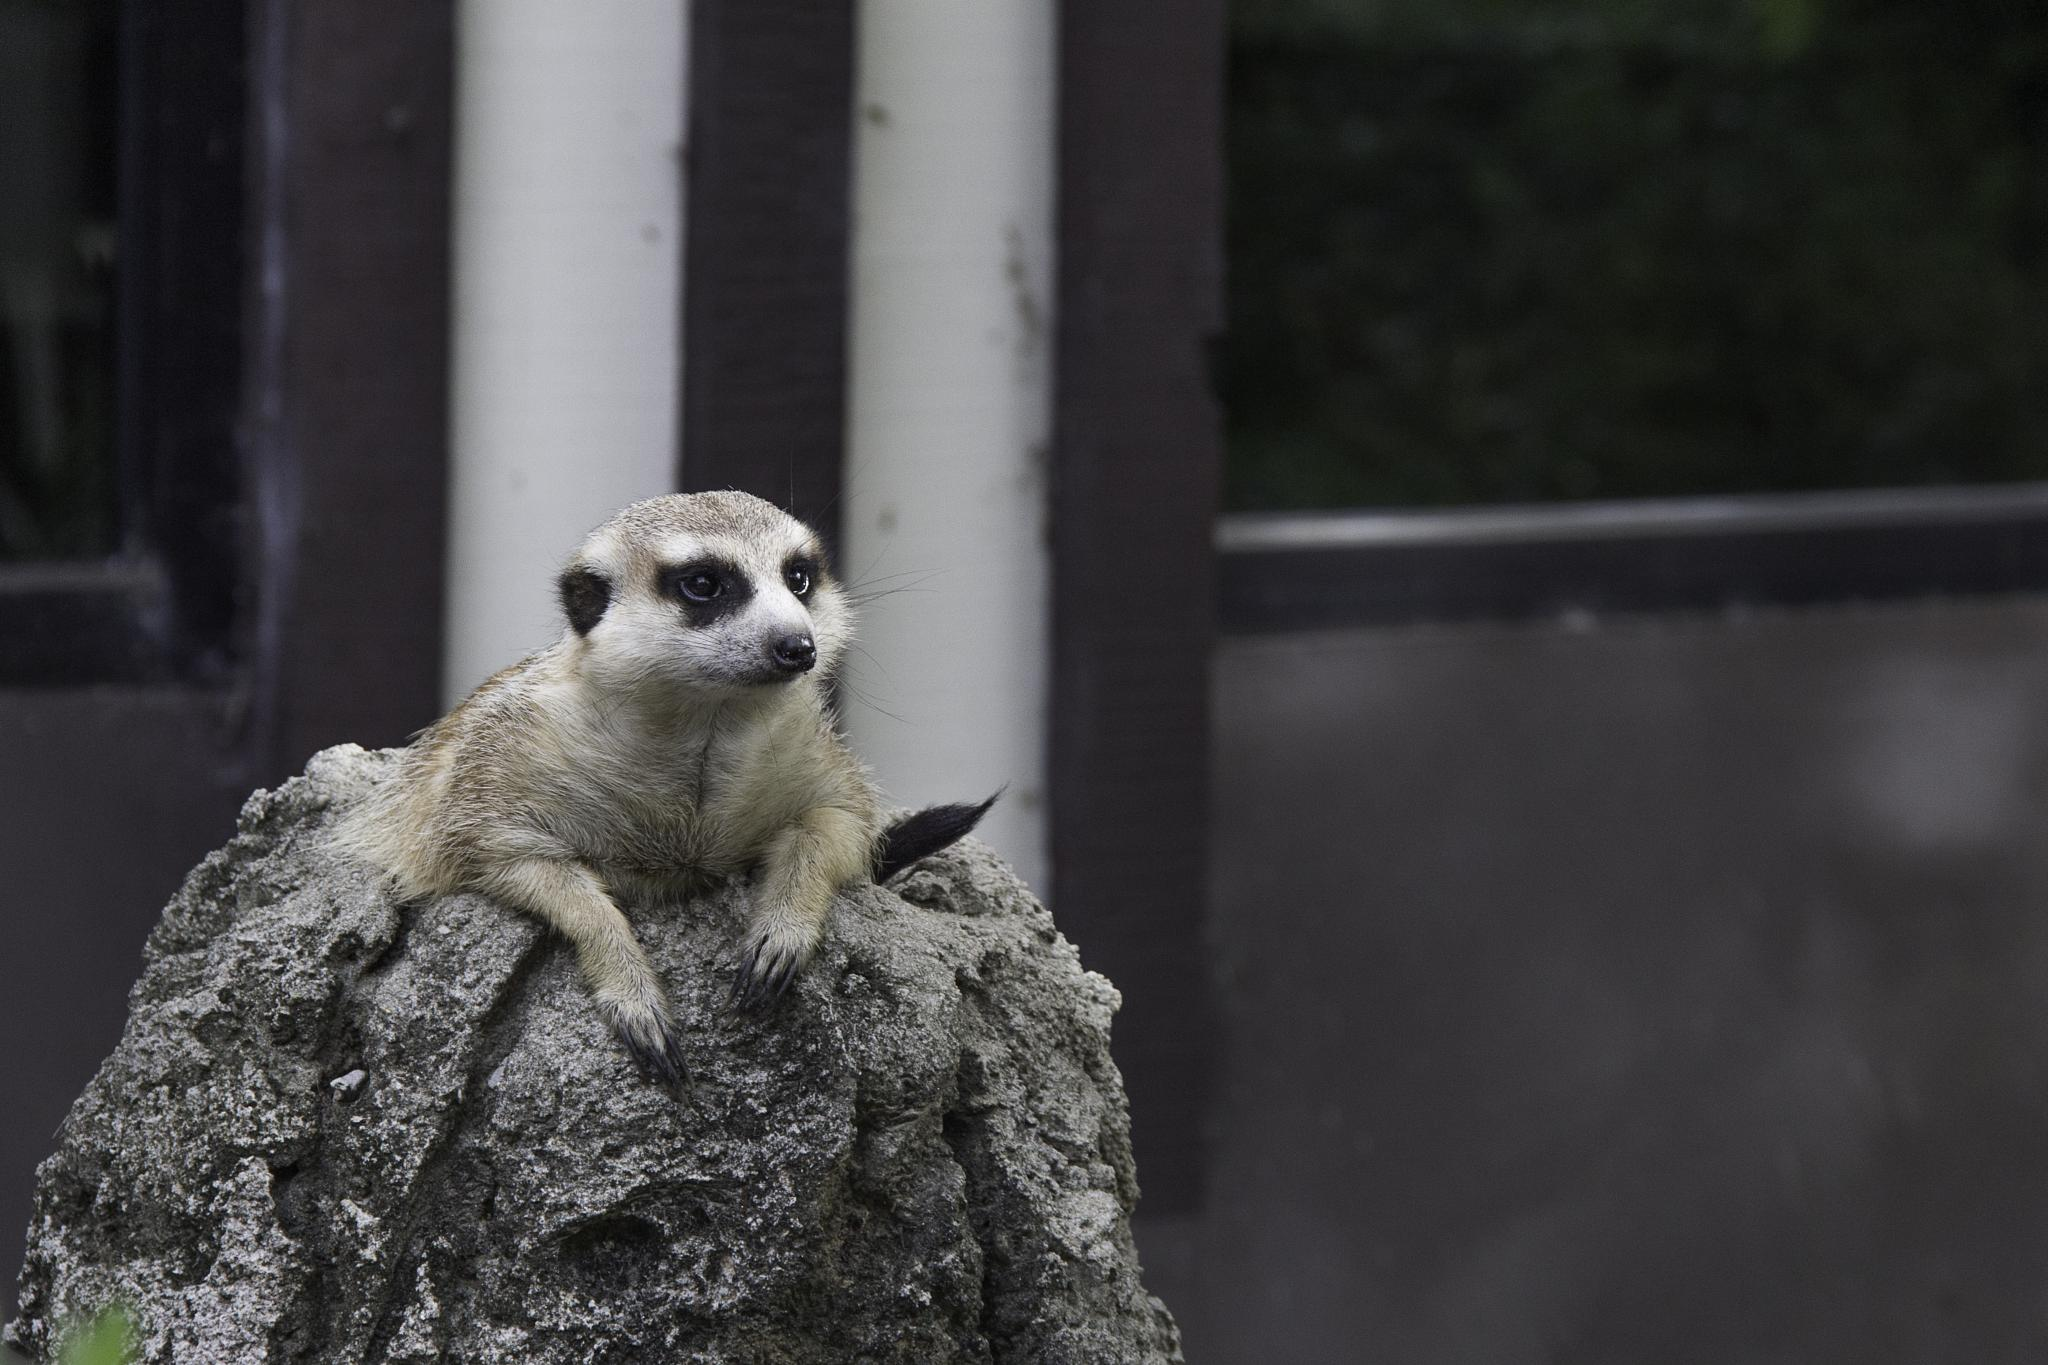 Meerkat by Christopher Ward